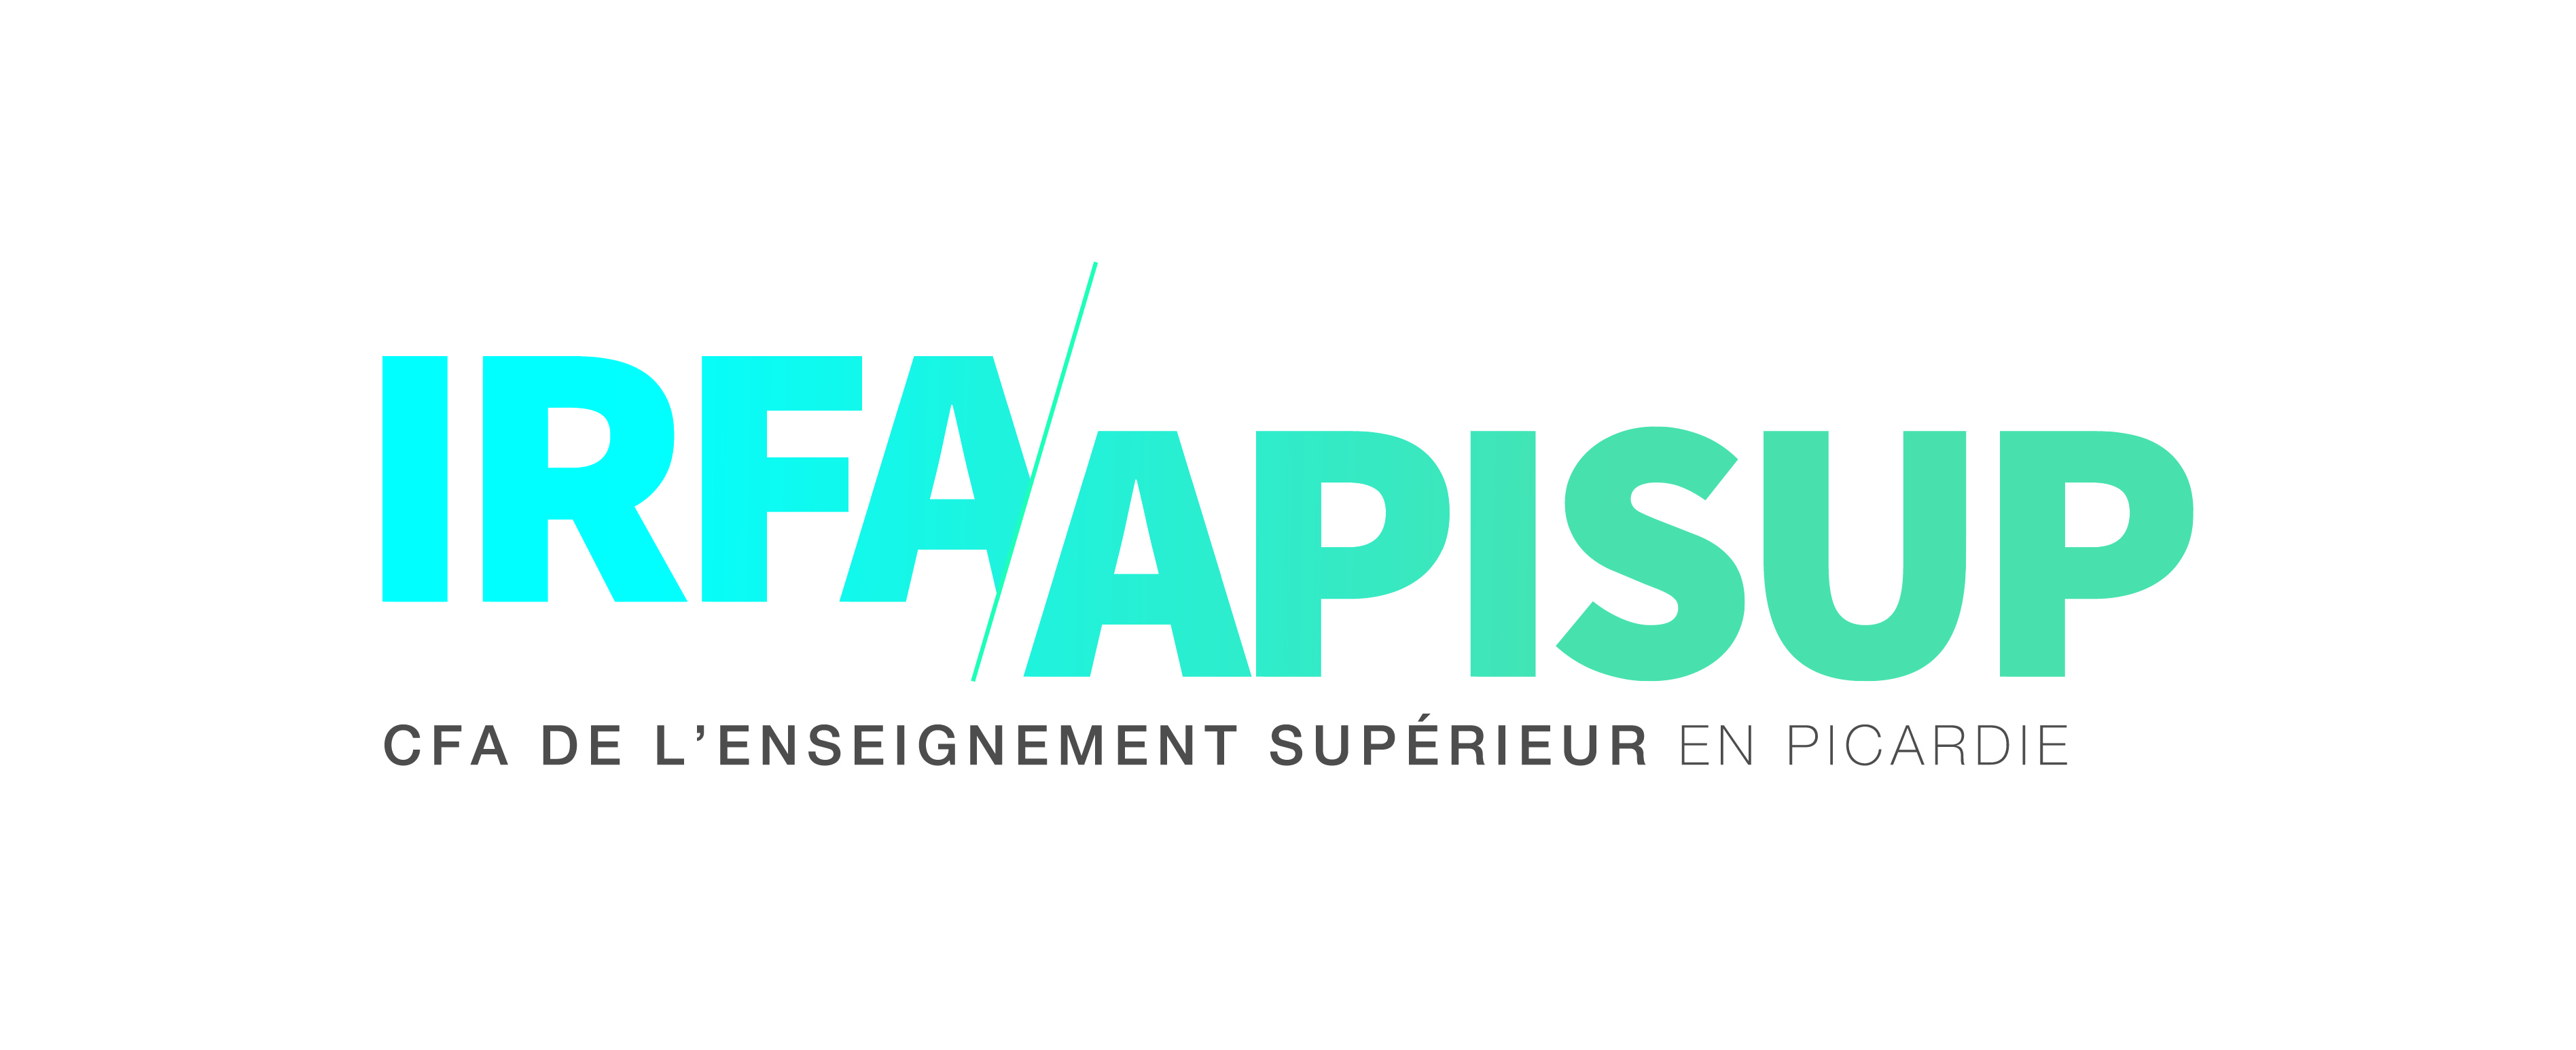 CFA IRFA-APISUP